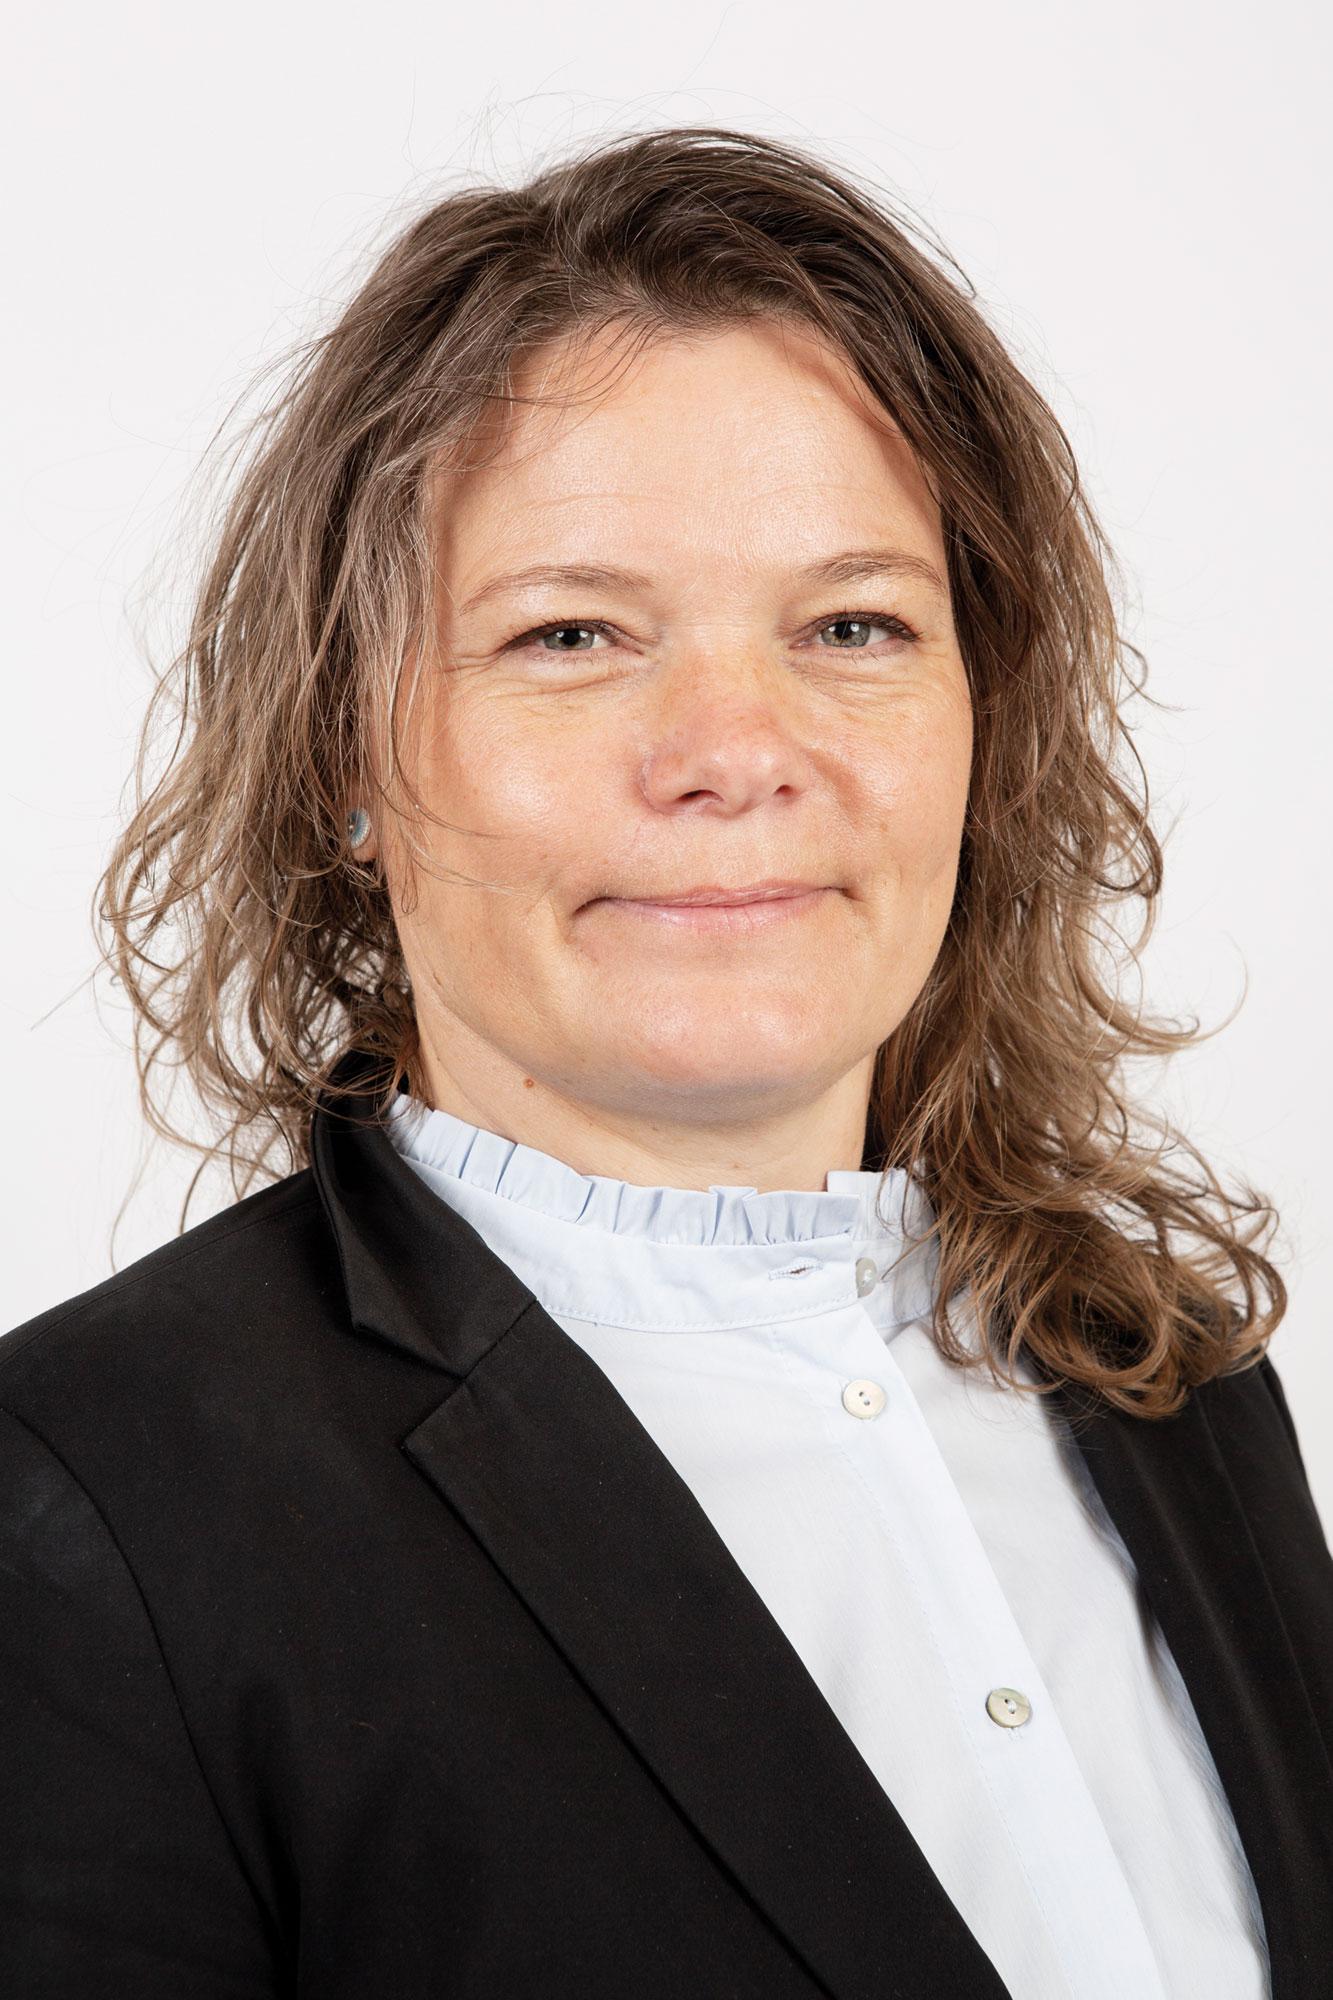 Kamille Ebbe